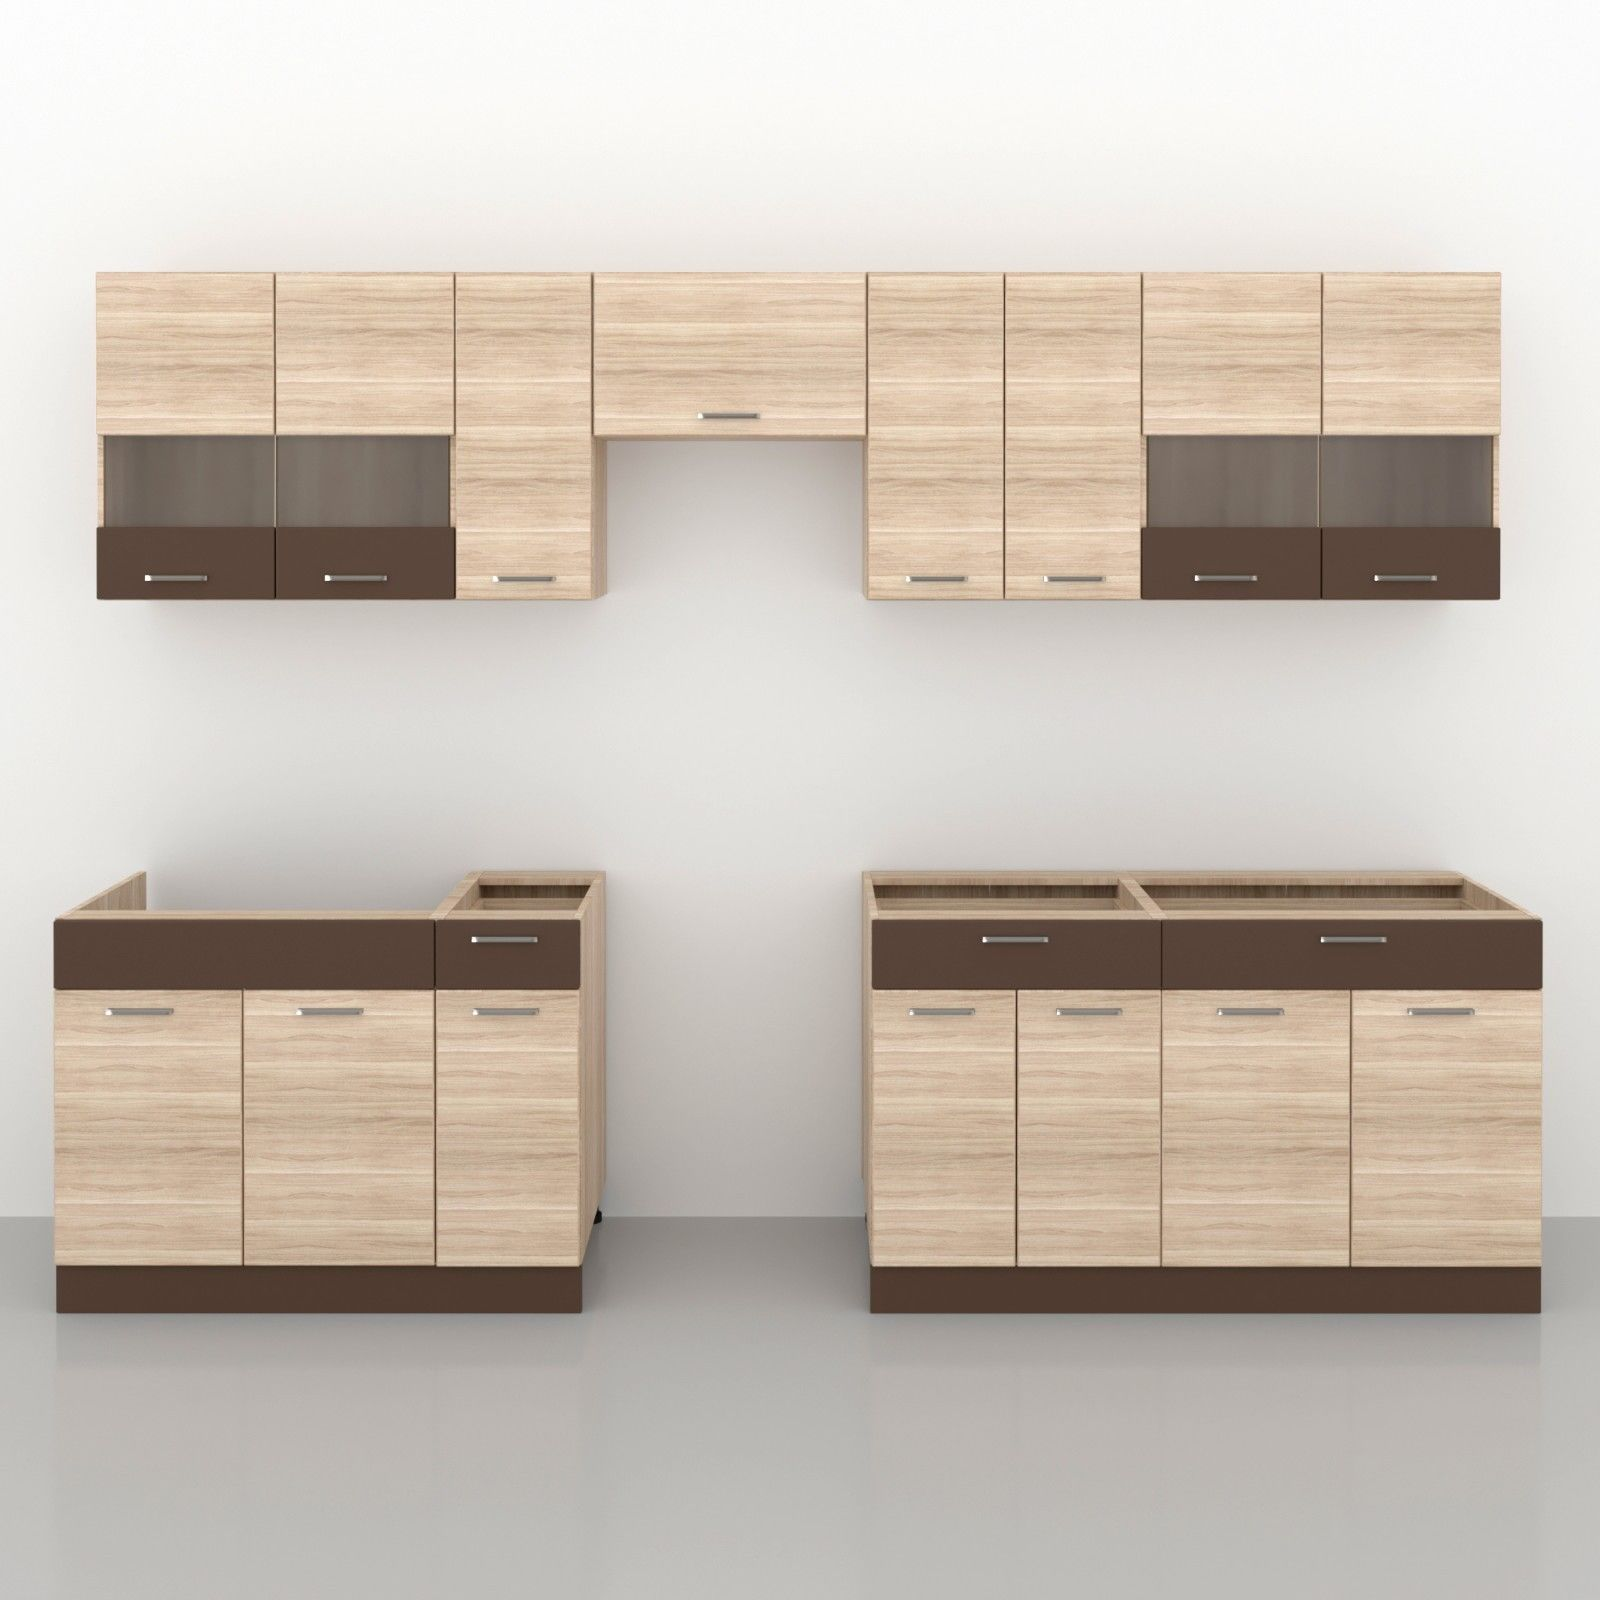 Küche ALINA 310 cm – Möbel DENA